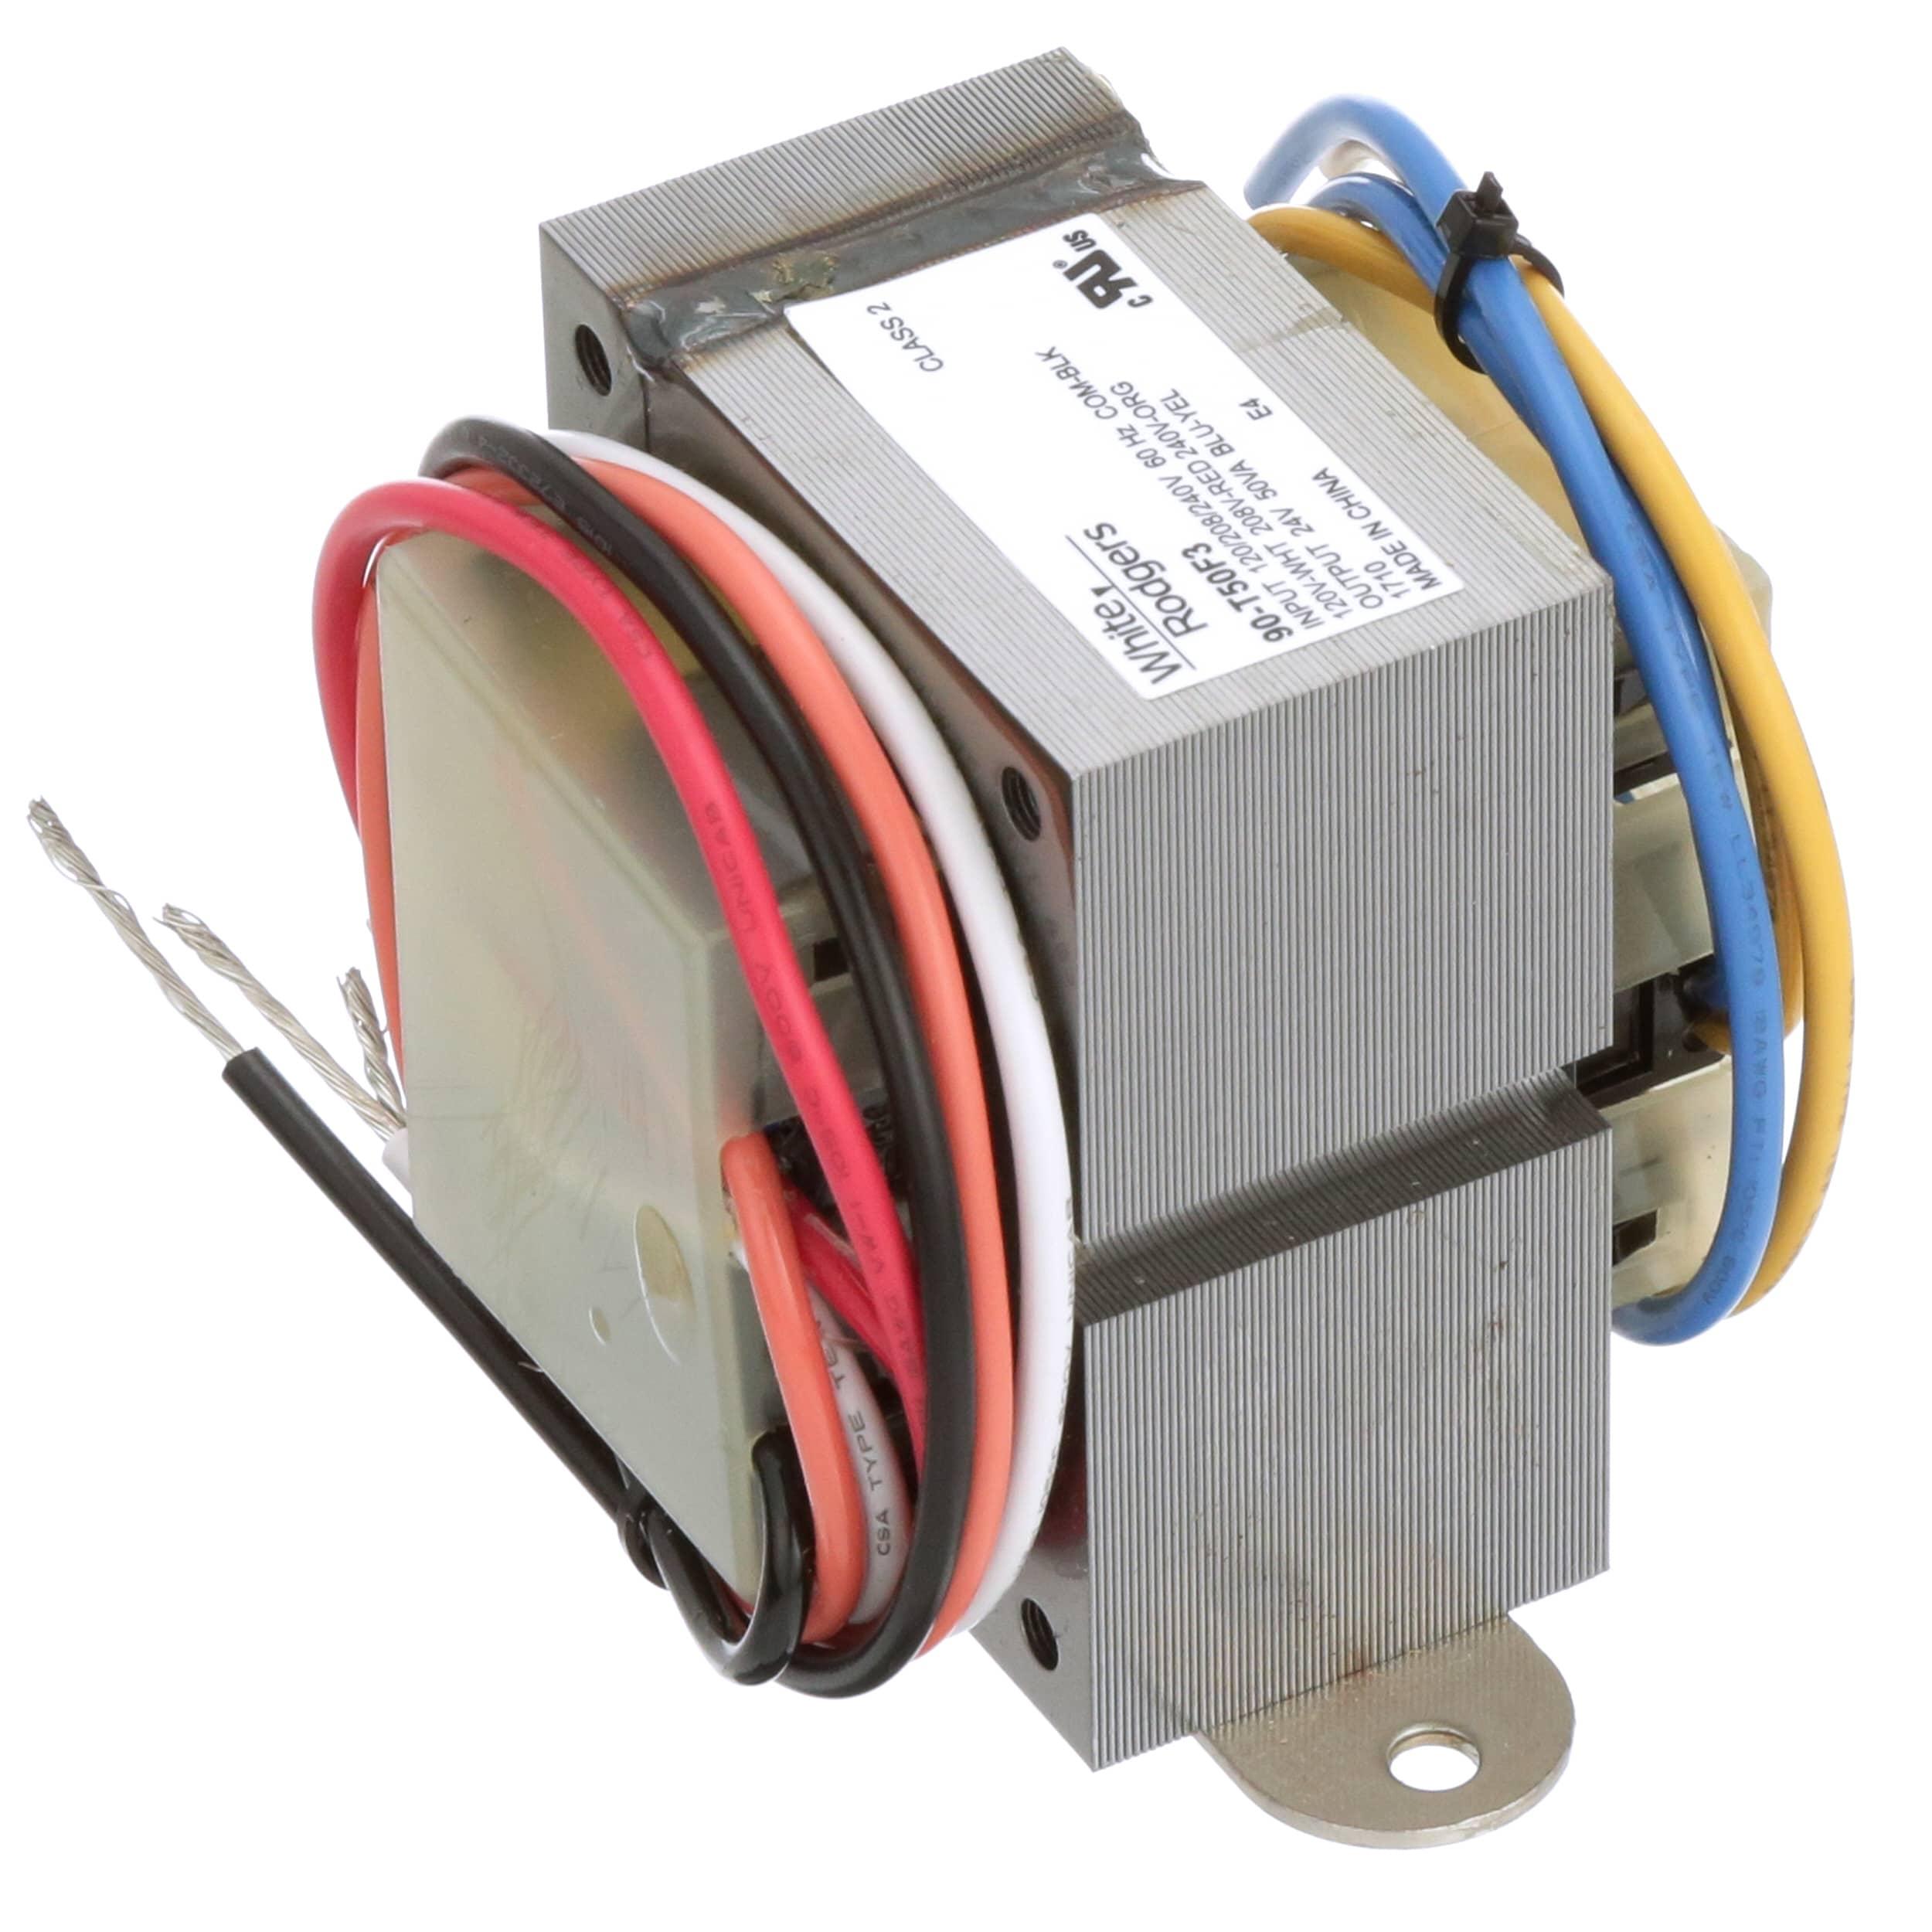 Details About 24 Volt Hvac Control Circuit Transformer 40 Va Class 2